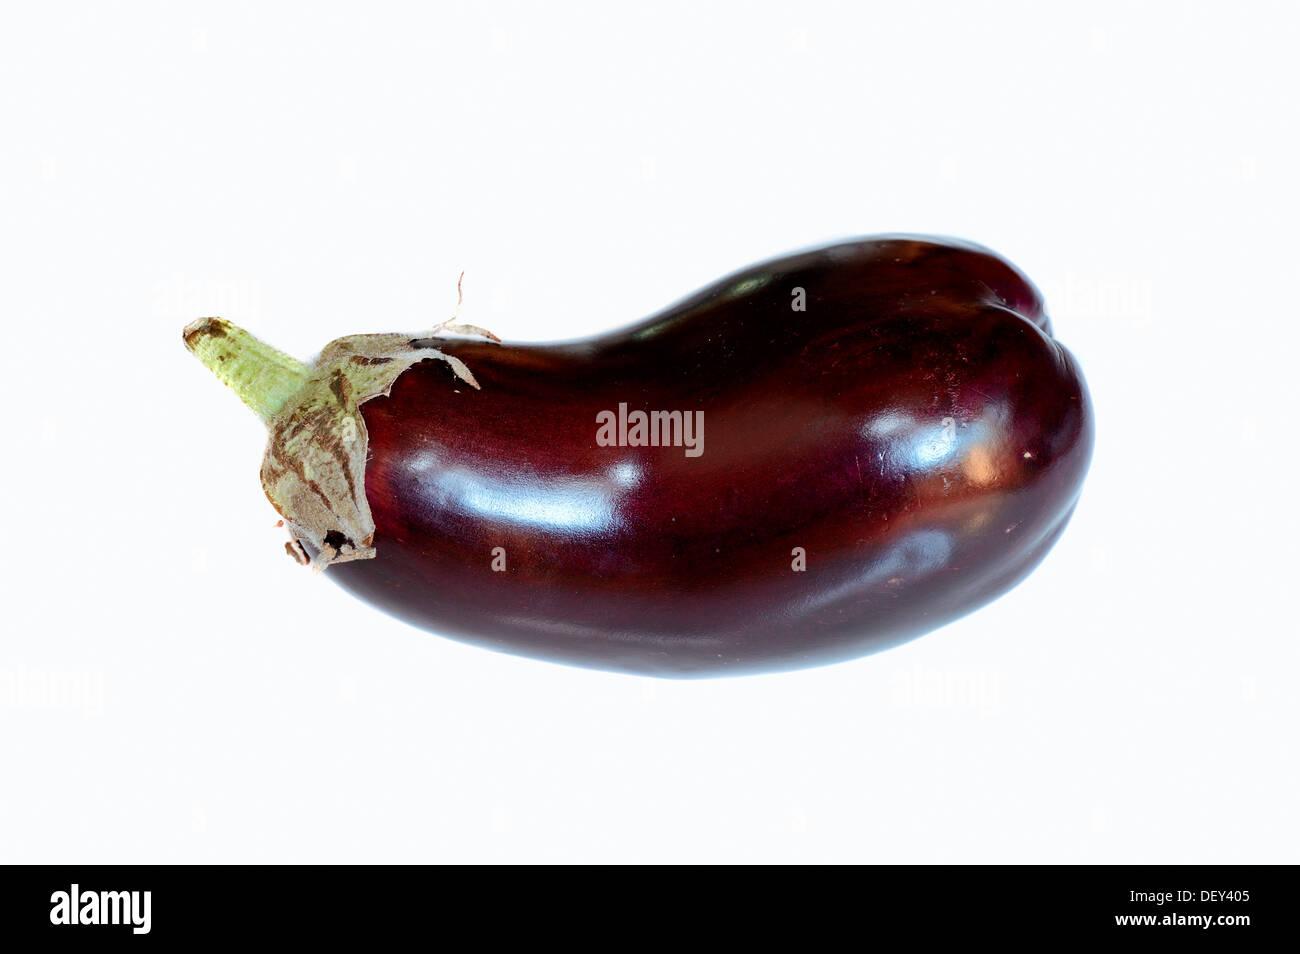 Aubergine or Eggplant (Solanum melongena) Stock Photo